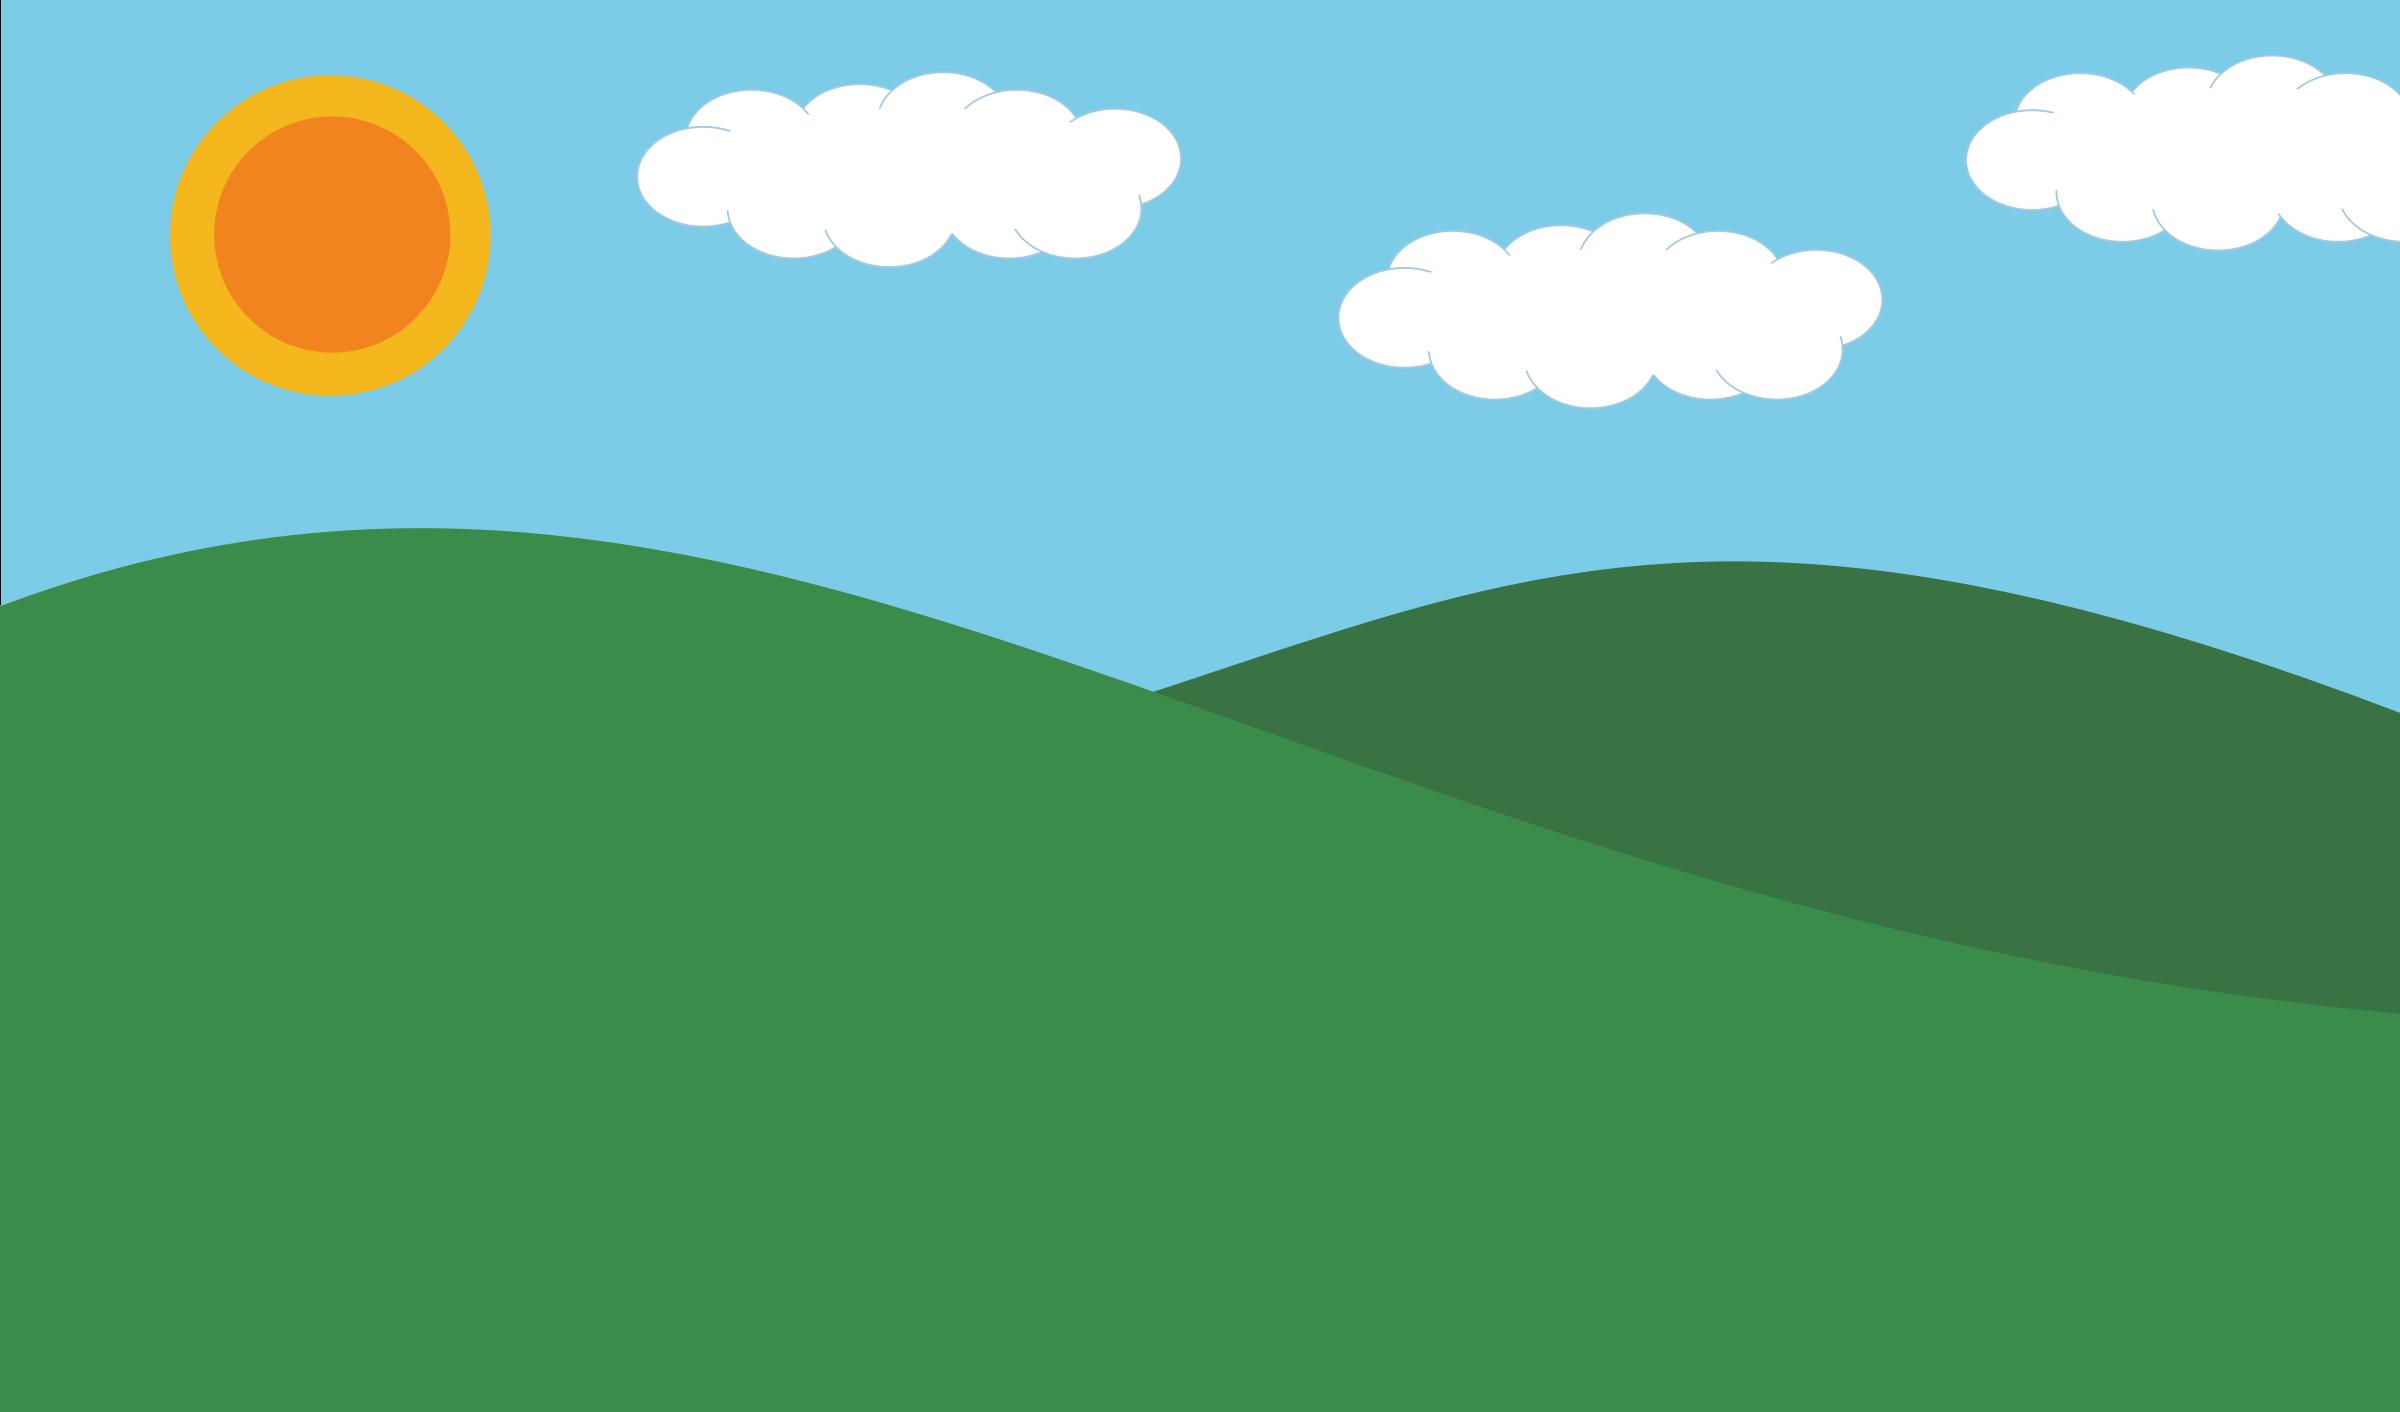 Land clipart hillside, Land hillside Transparent FREE for.